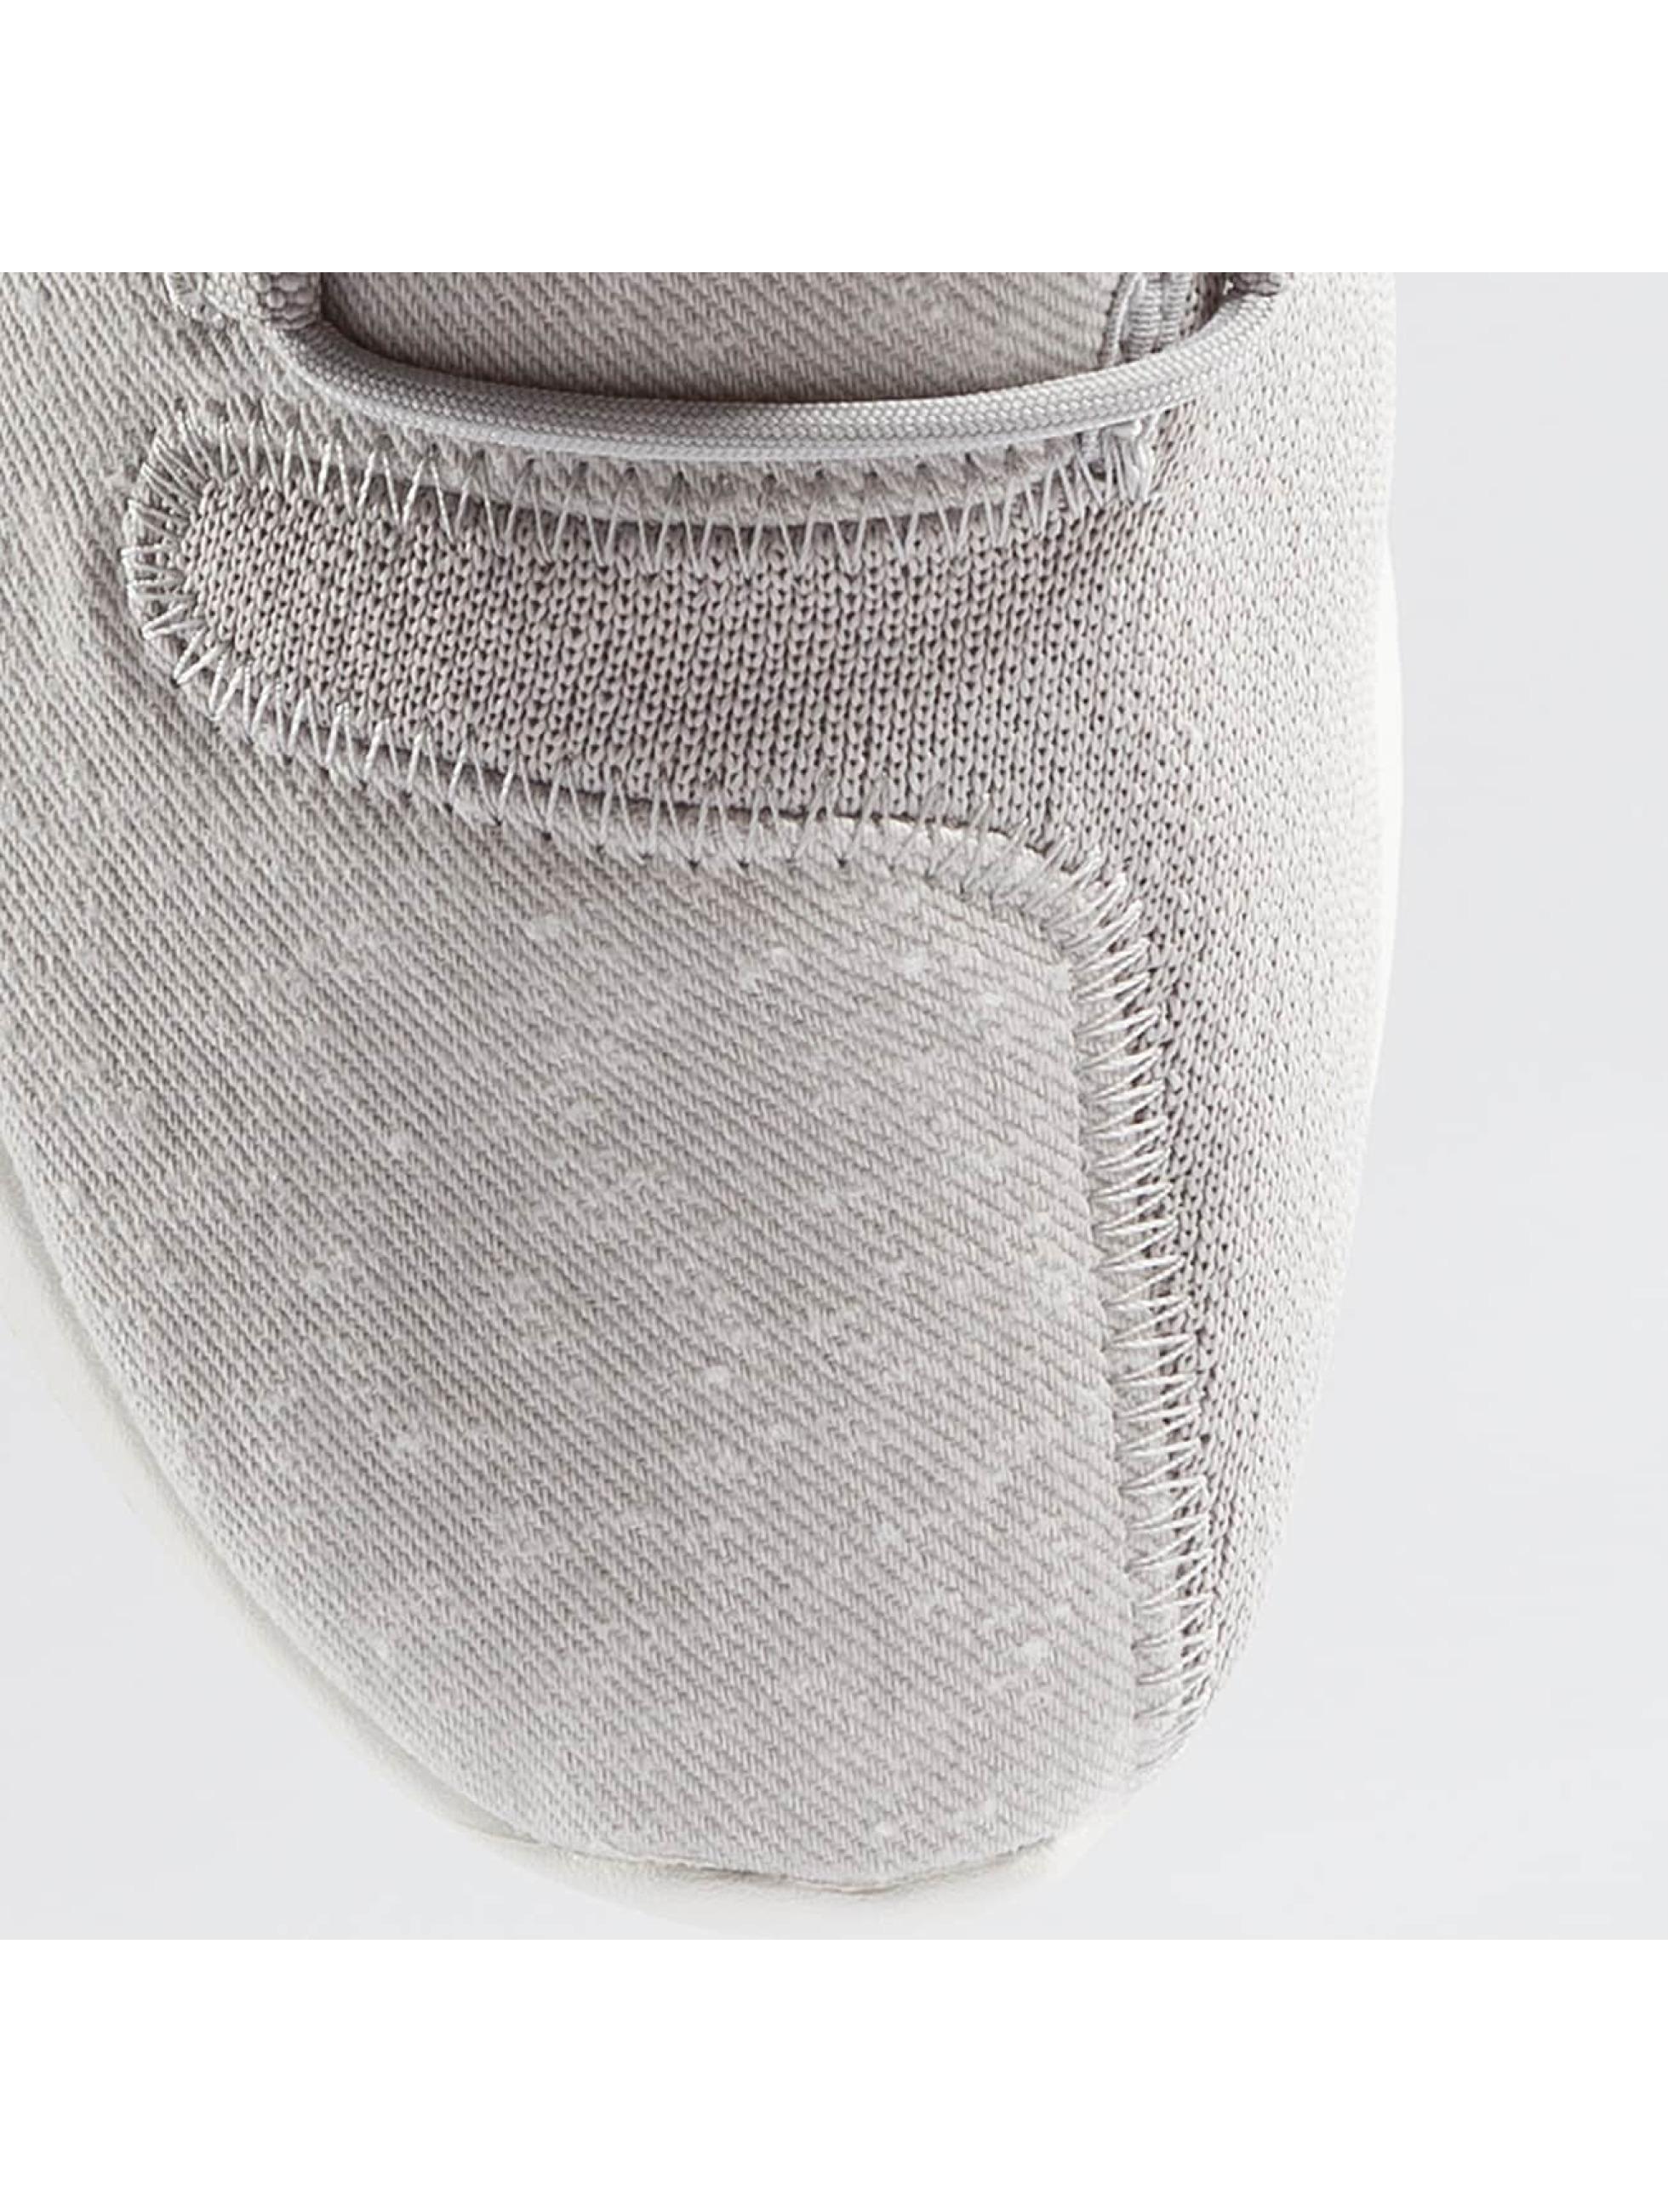 adidas originals Sneakers Tubular Shadow szary